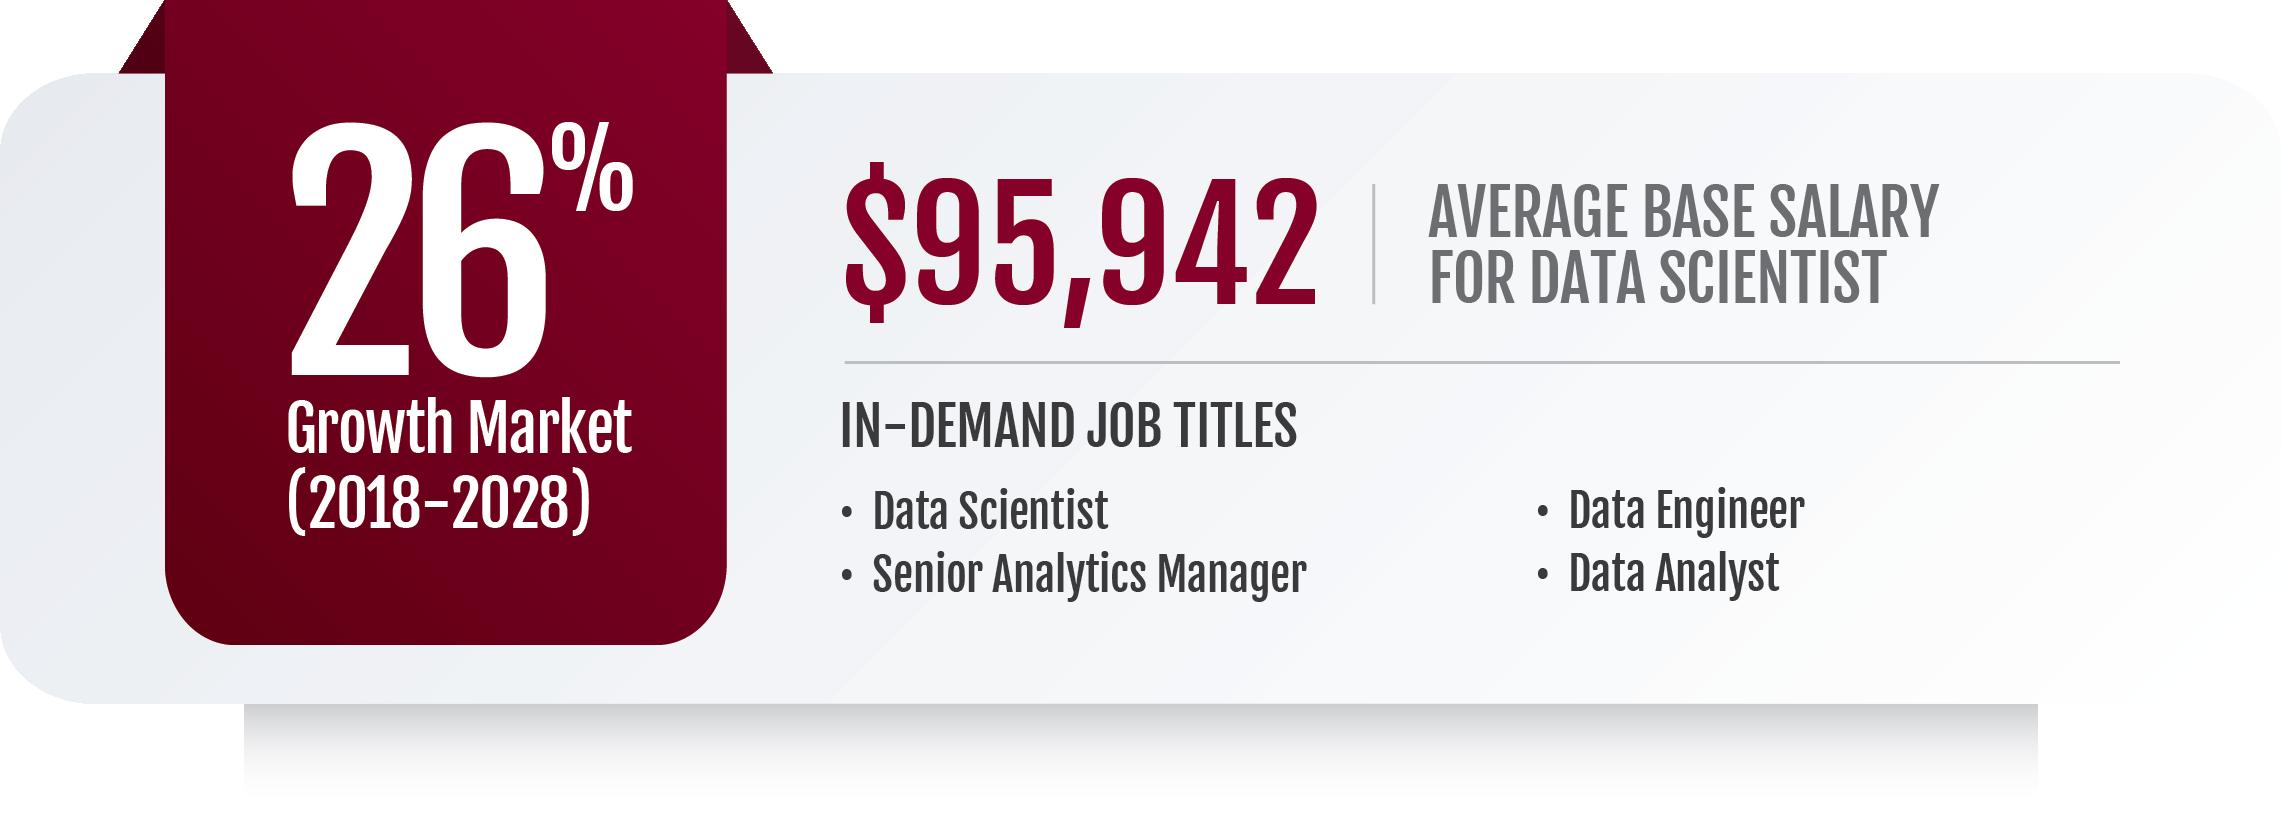 Online MBA in Data Analytics Salaries Infographic